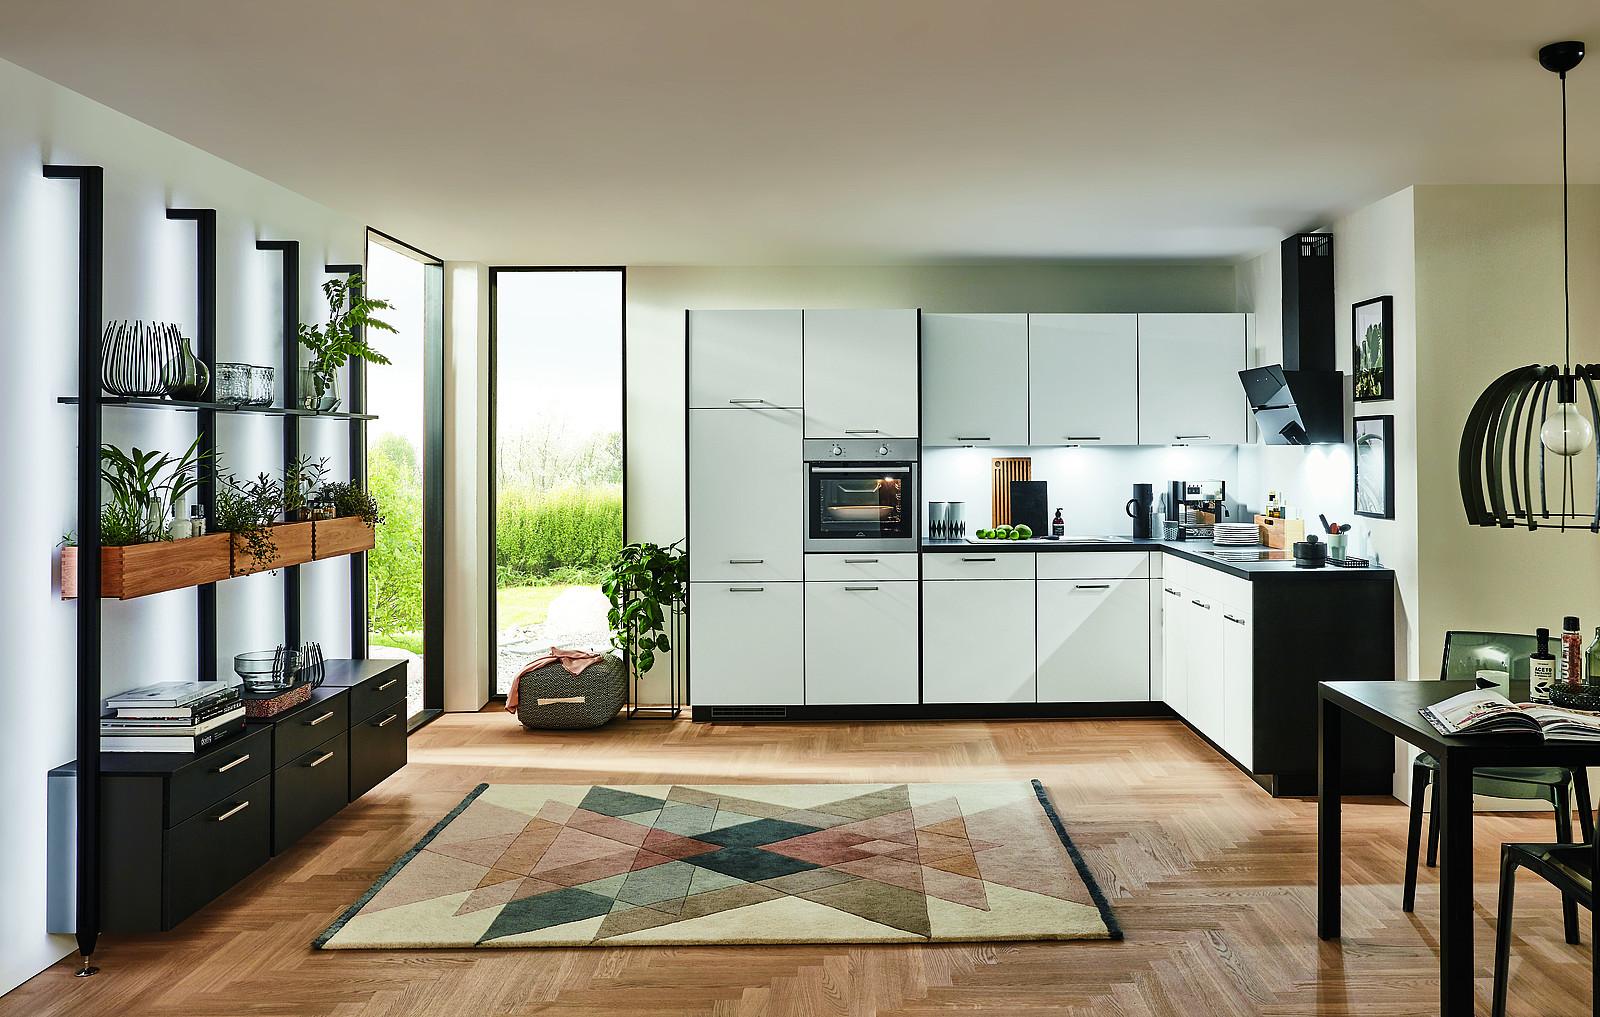 Full Size of Küche Boden Abdichten Bodenbelag Küche Steinoptik Kunststoff Bodenbelag Küche Welcher Boden Für Küche Küche Bodenbelag Küche